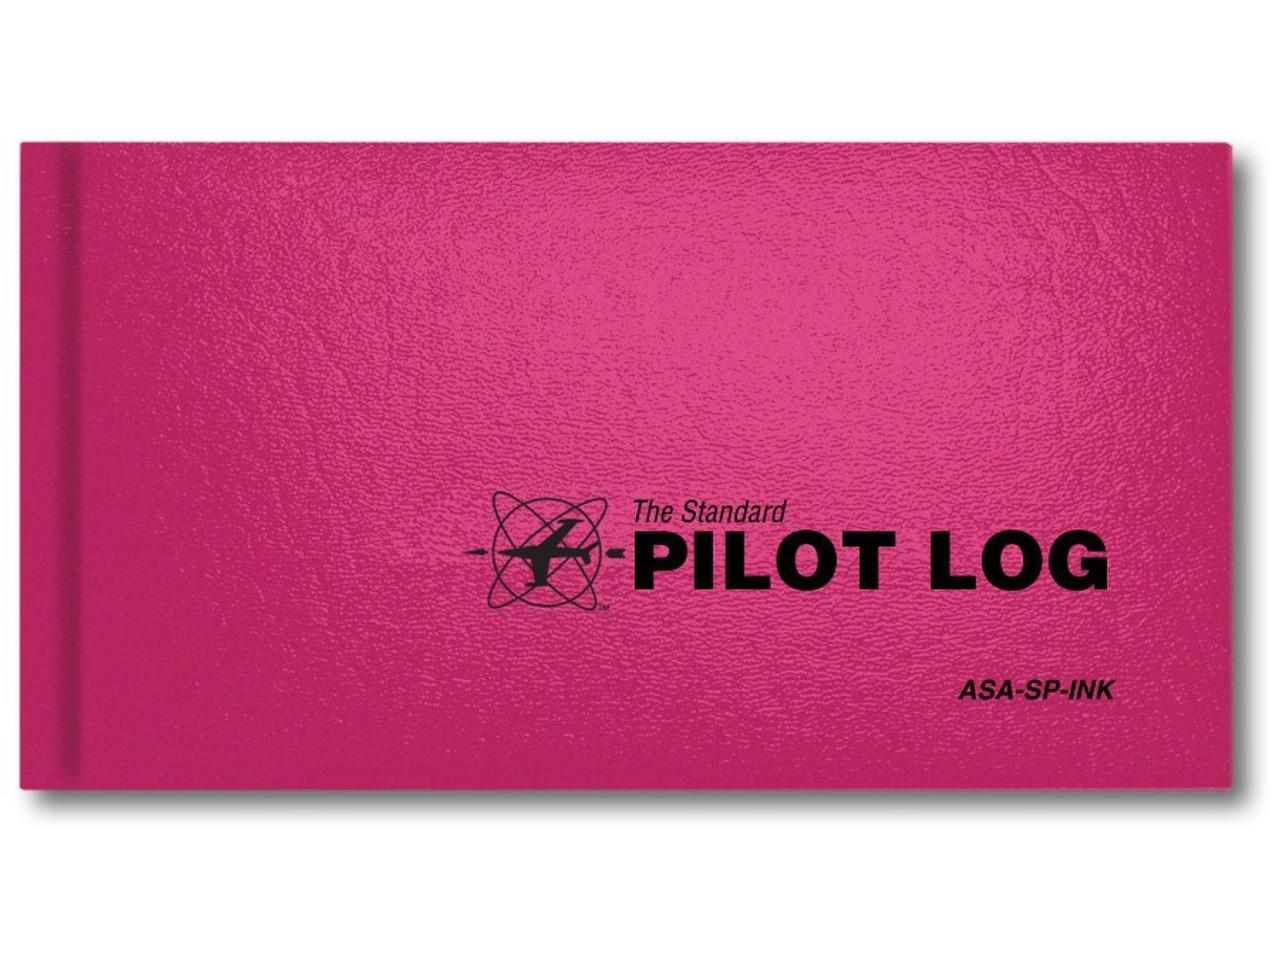 ASA Standard Pilot Logbook - Pink (ASA-SP-INK)-SkySupplyUSA